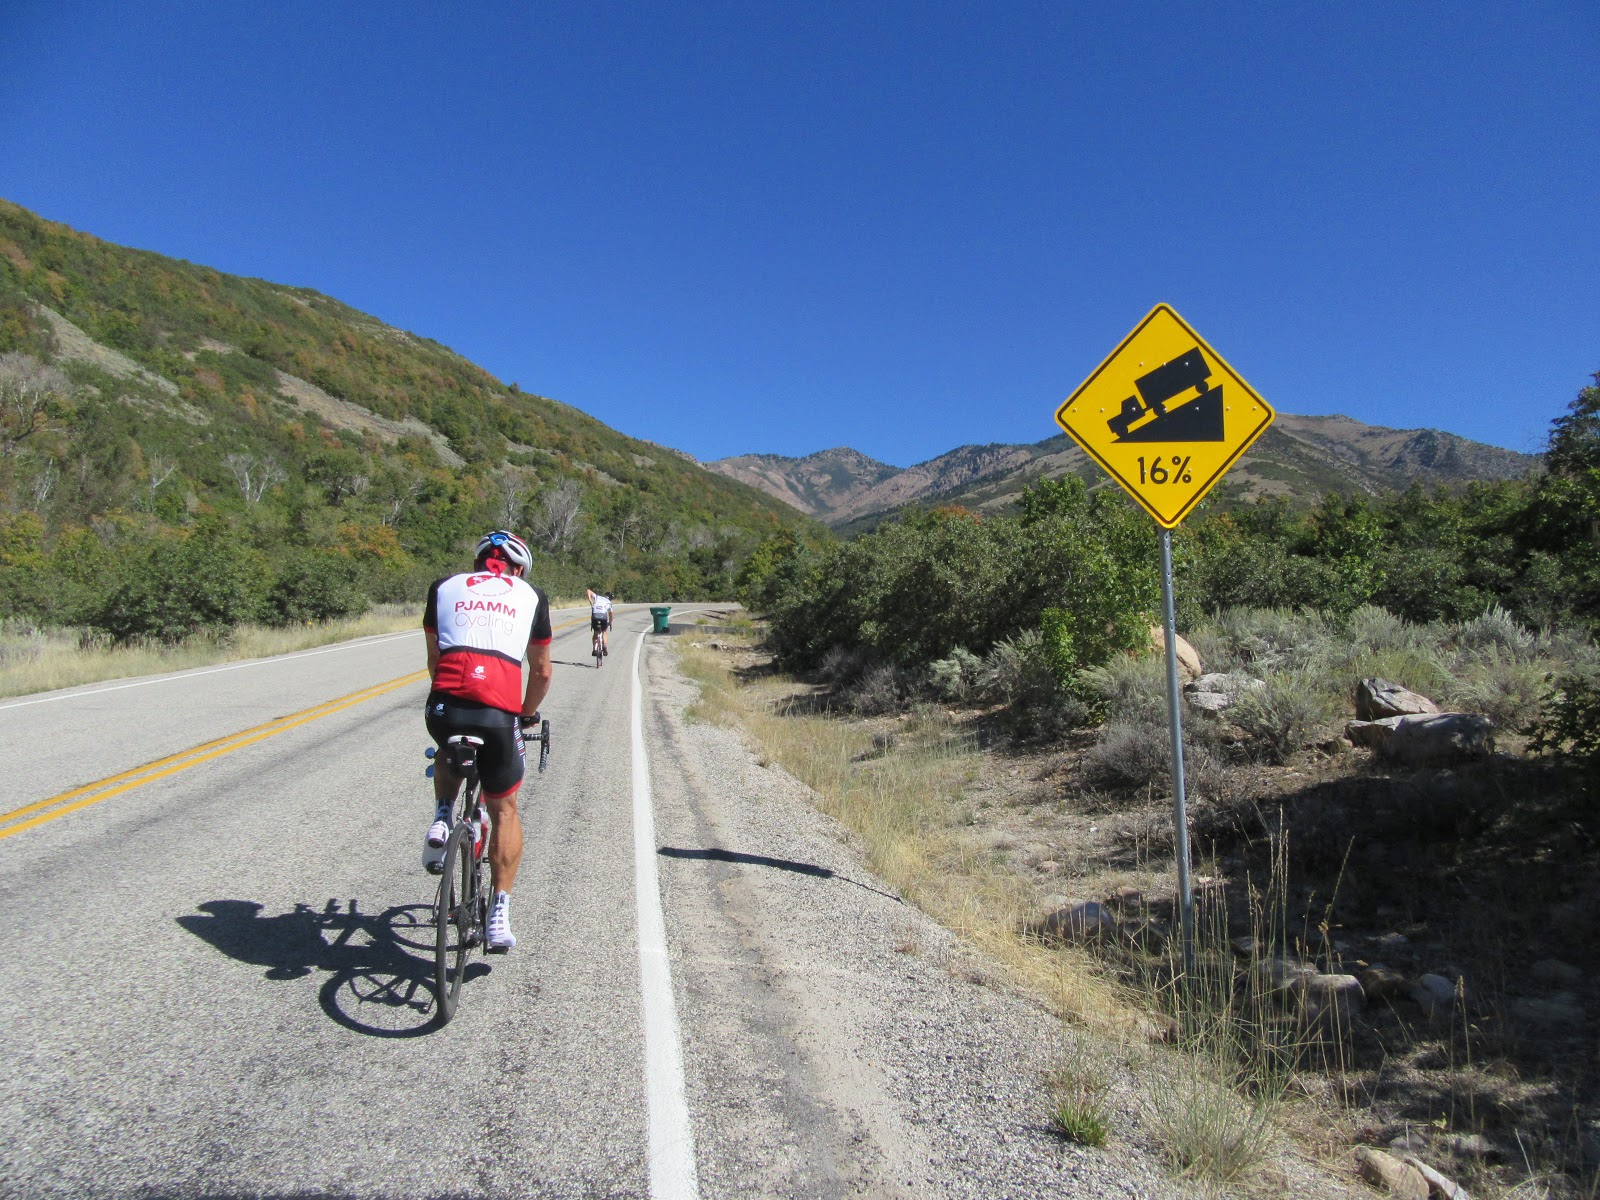 PJAMM bicyclist passing steep grade sign on Powder Mountain bike climb